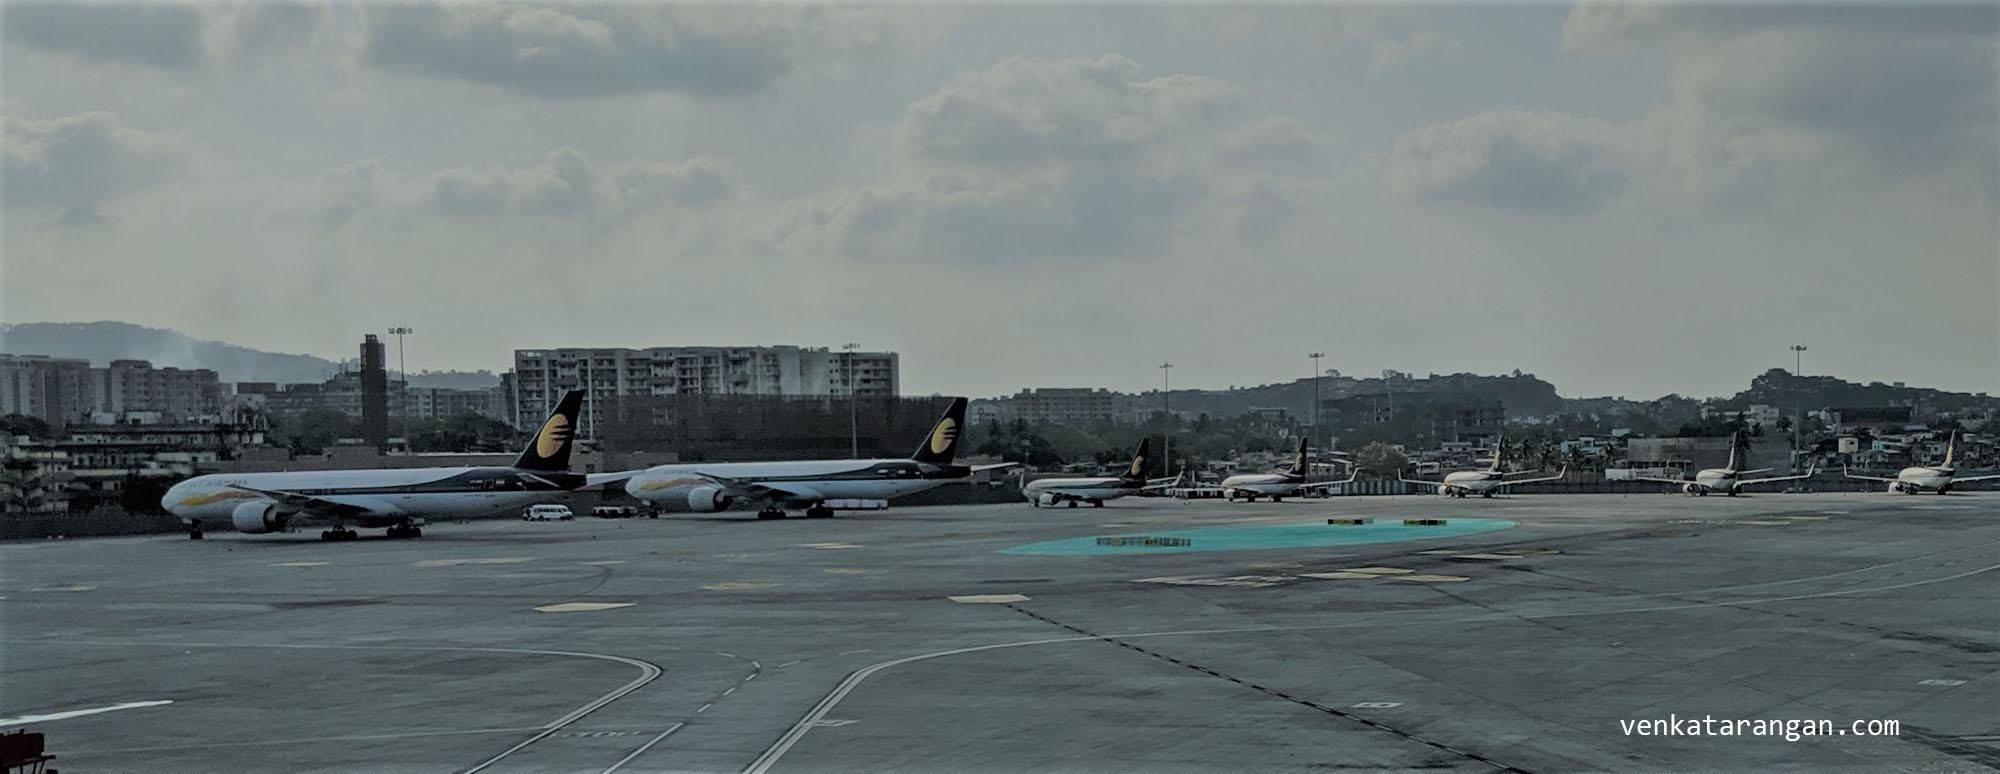 Jet Airways Grounded in Terminal 2 Chatrapati-Shivaji Terminal Mumbai